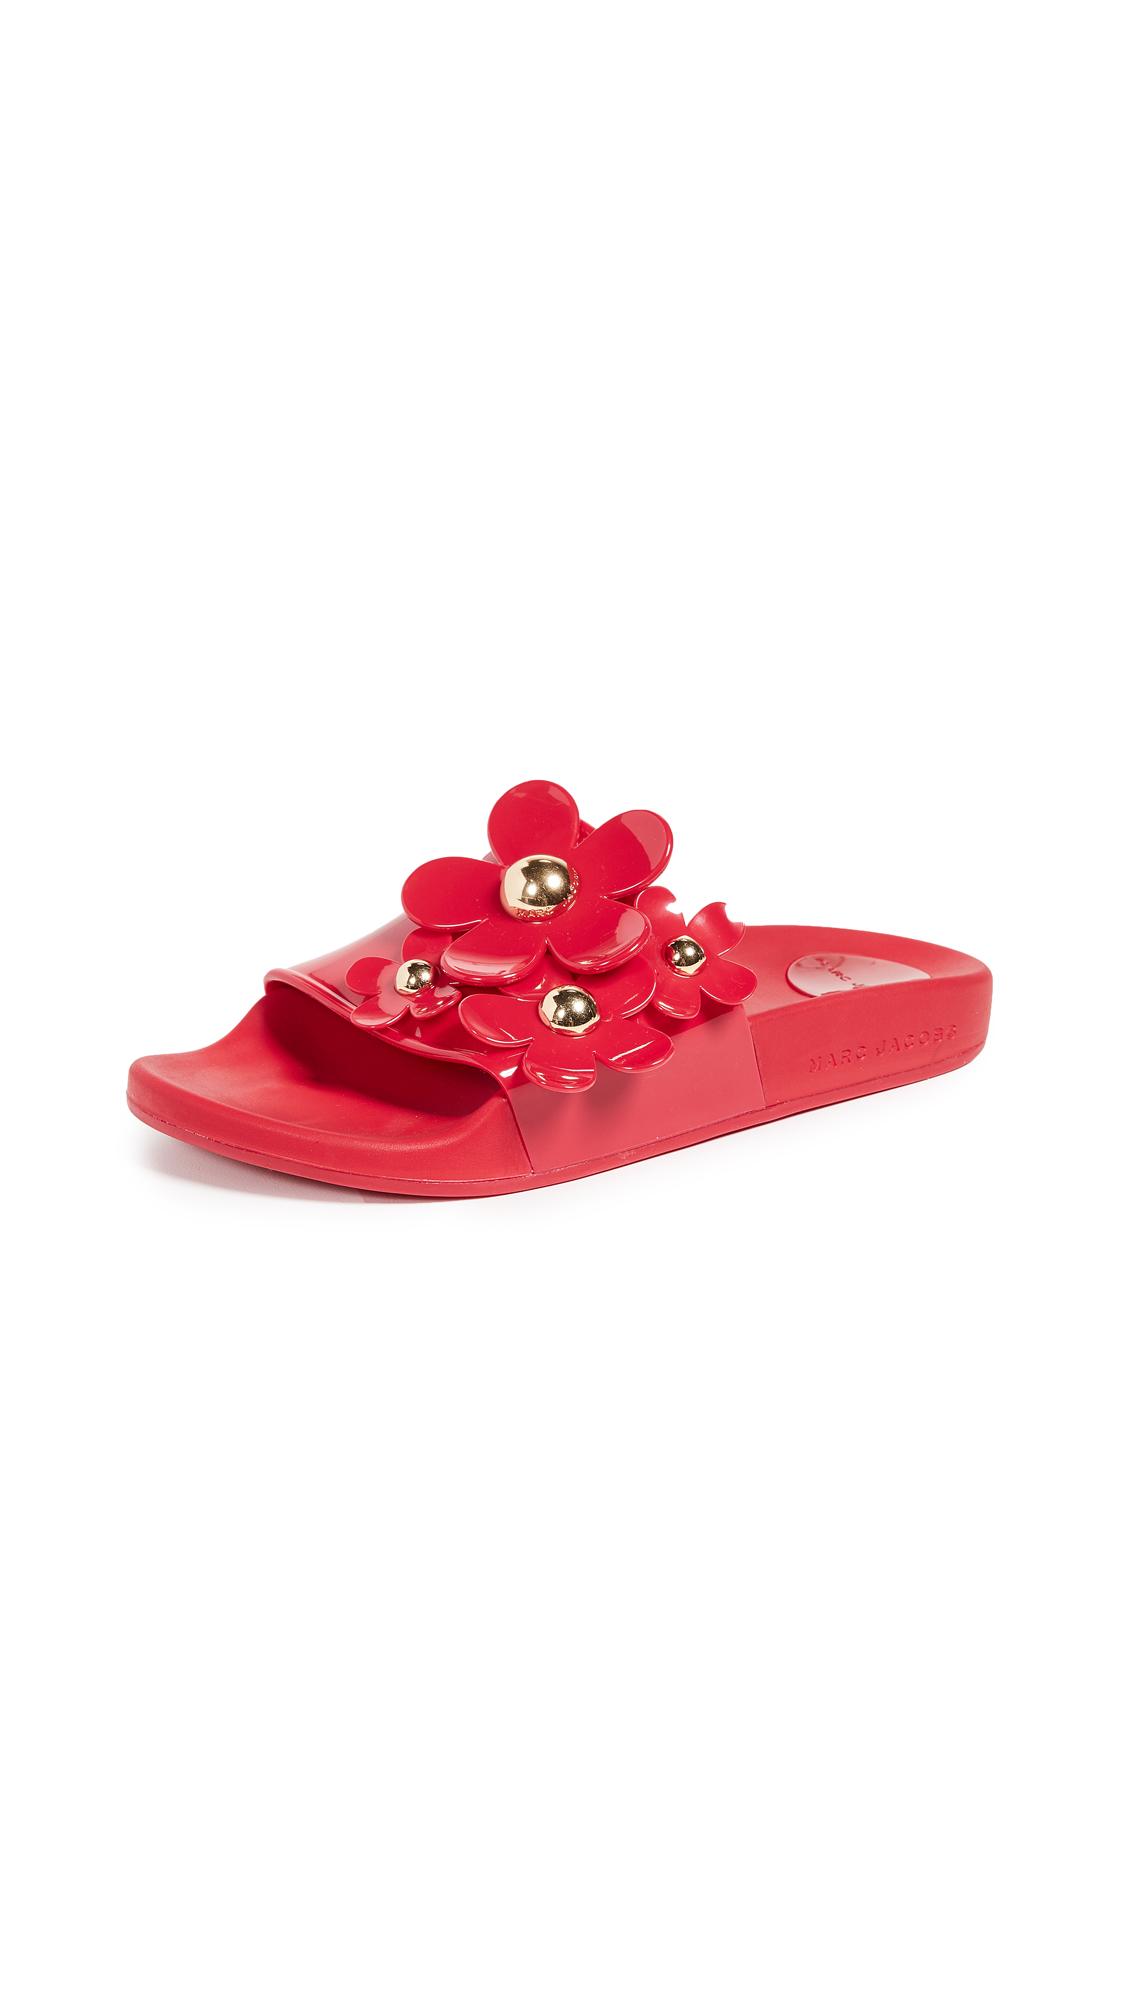 Marc Jacobs Daisy Aqua Slides - Red